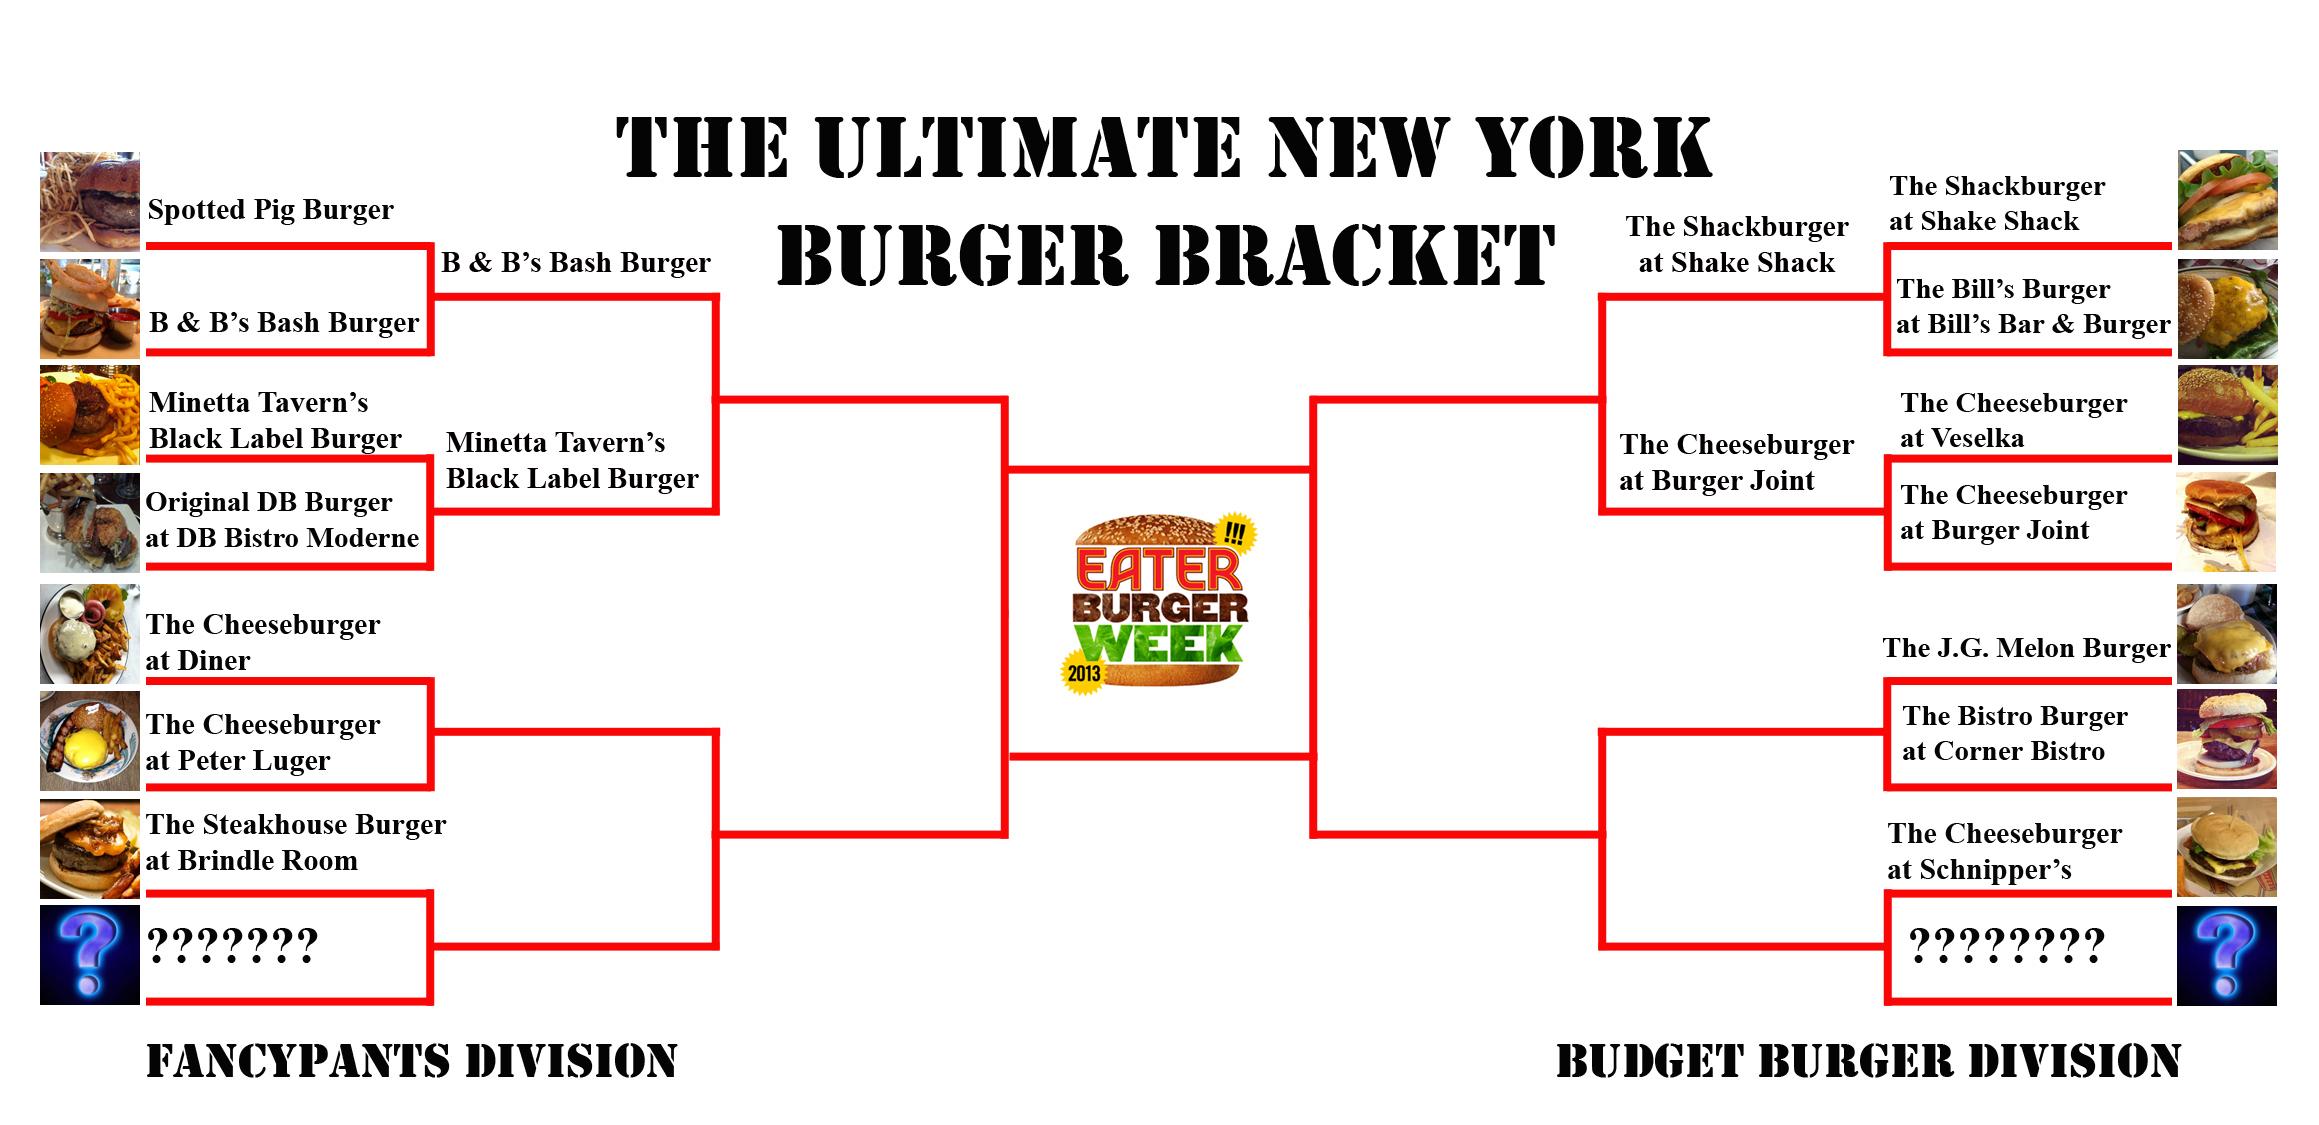 2013_burger_bracket_update_3.jpg